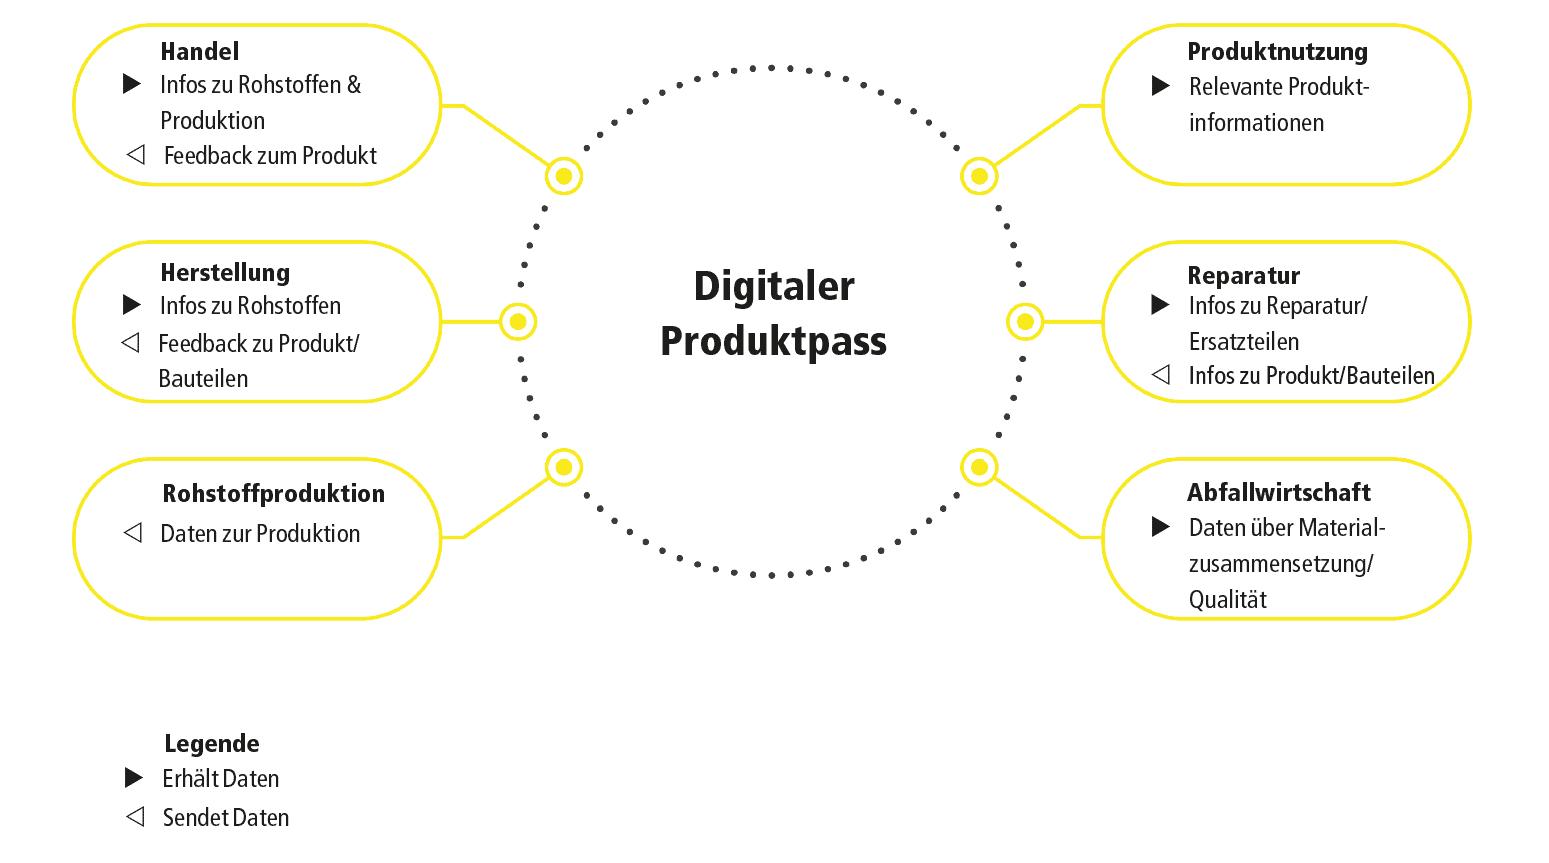 Grafik Digitaler Produktpass Datentransfer